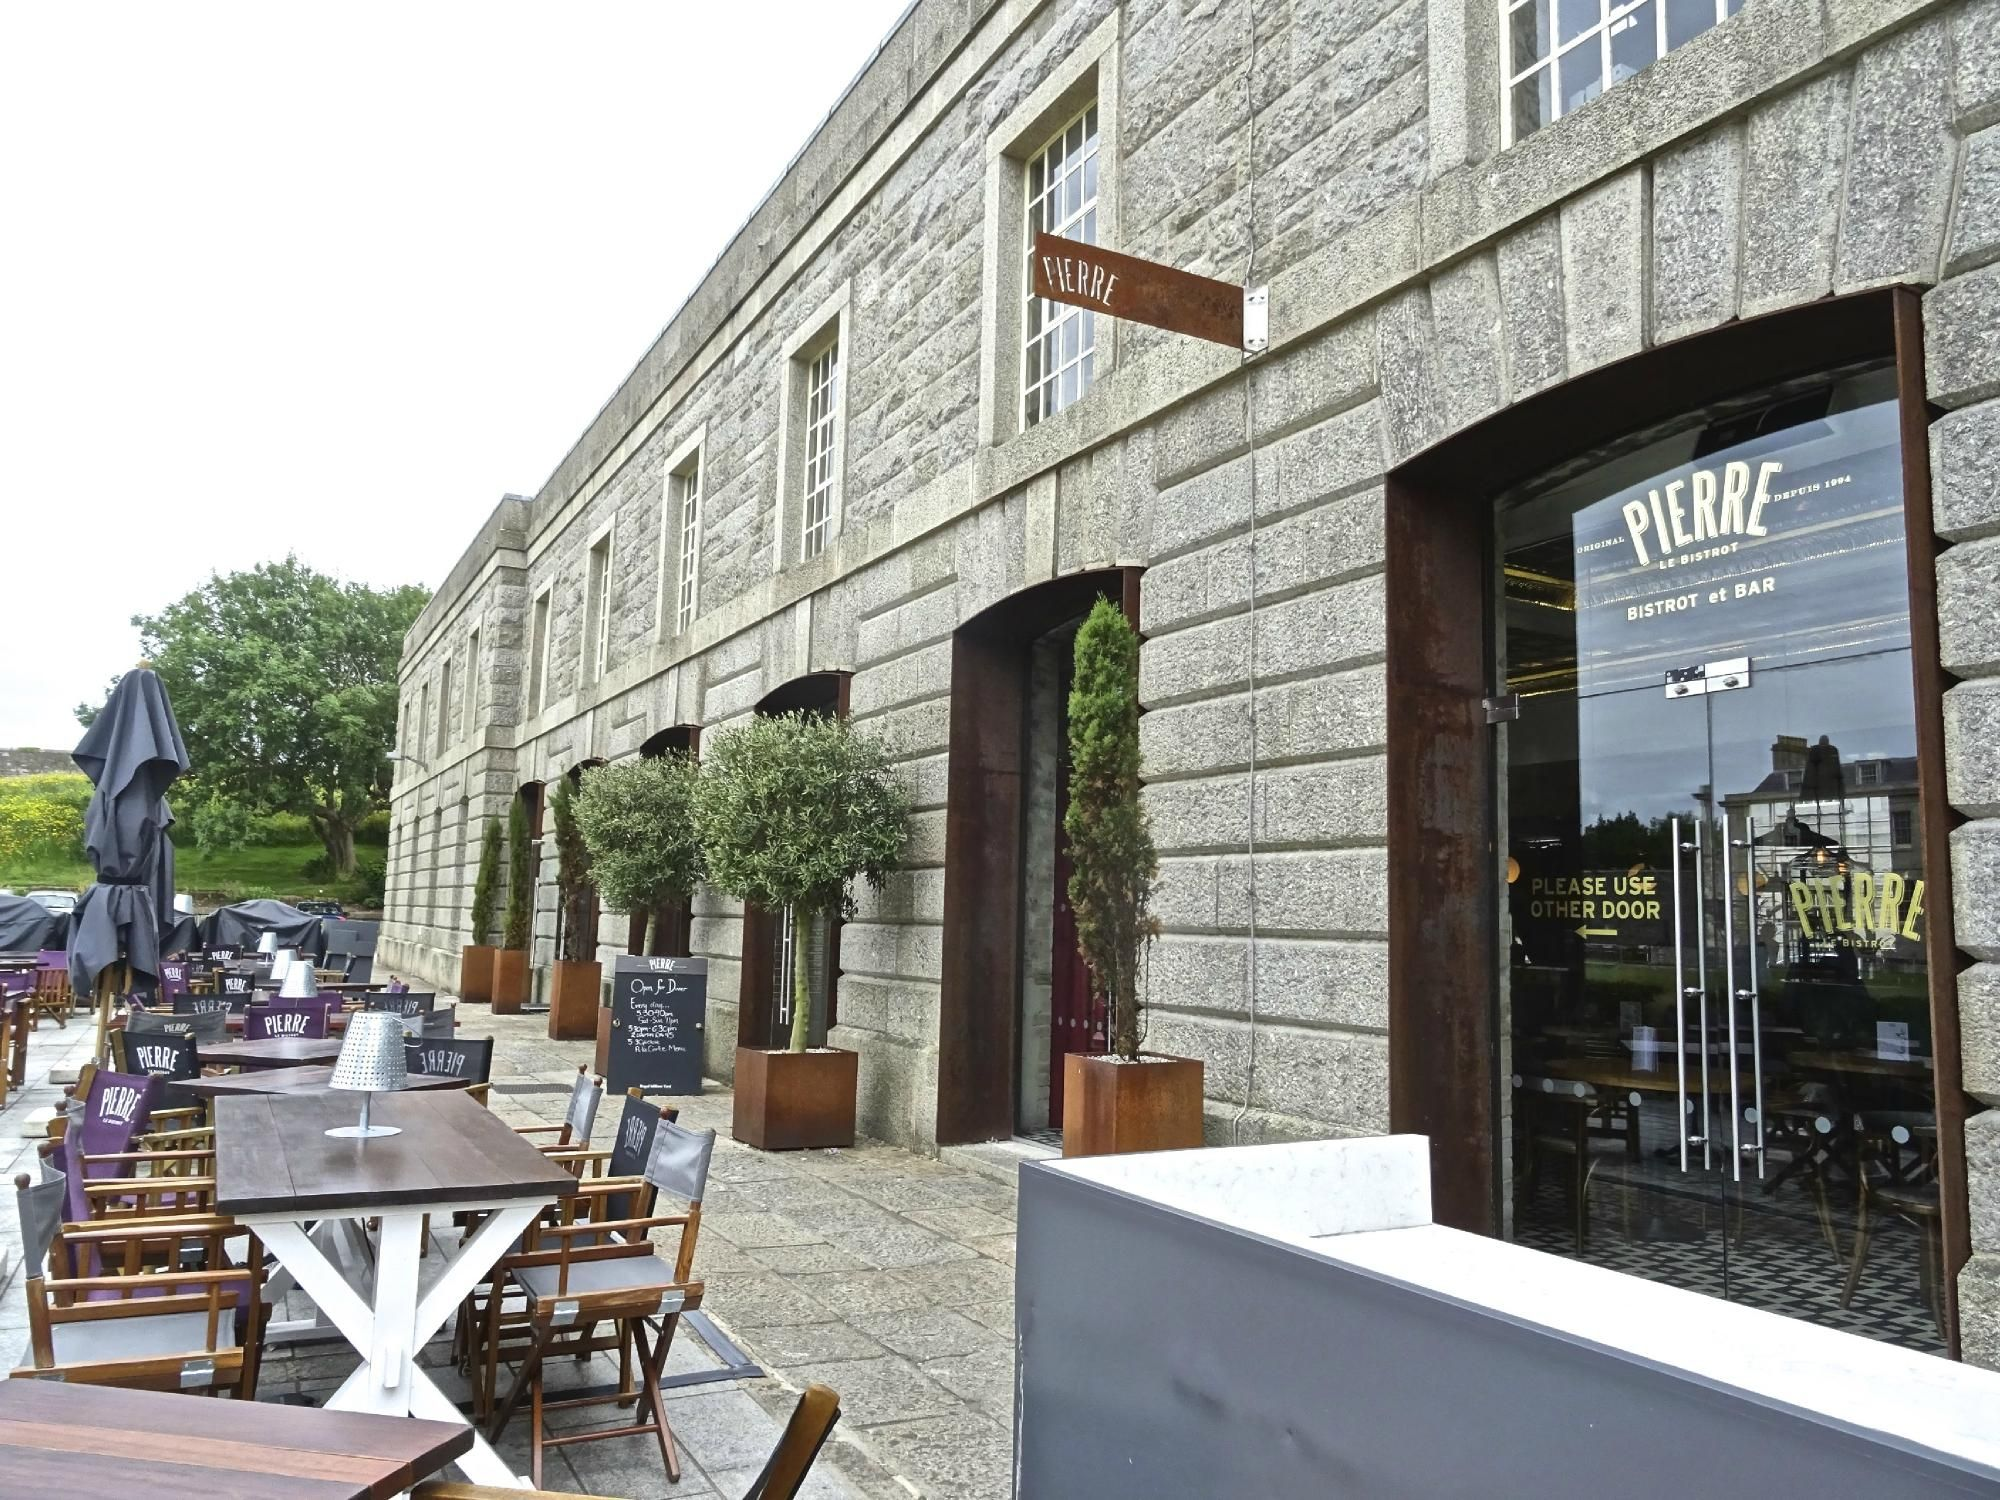 Bistrot Pierre In 2019 Business Expansion Ideas Restaurant